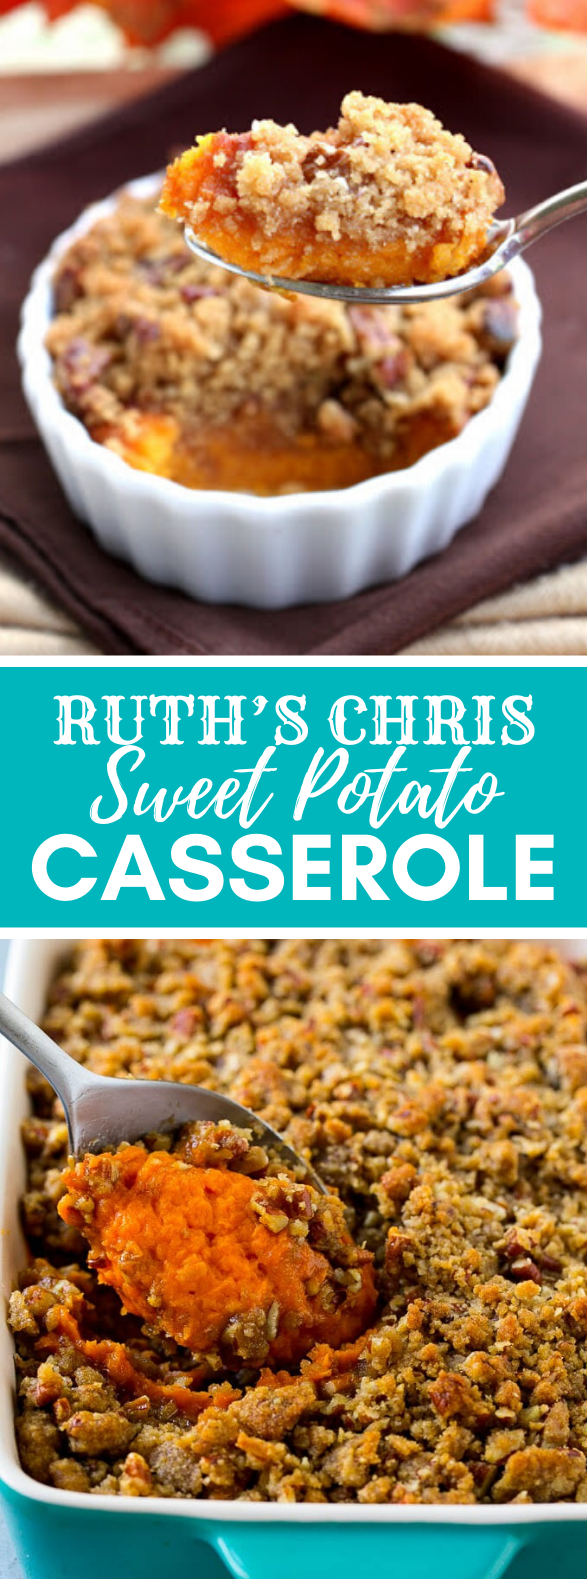 RUTH'S CHRIS SWEET POTATO CASSEROLE #dinner #healthy